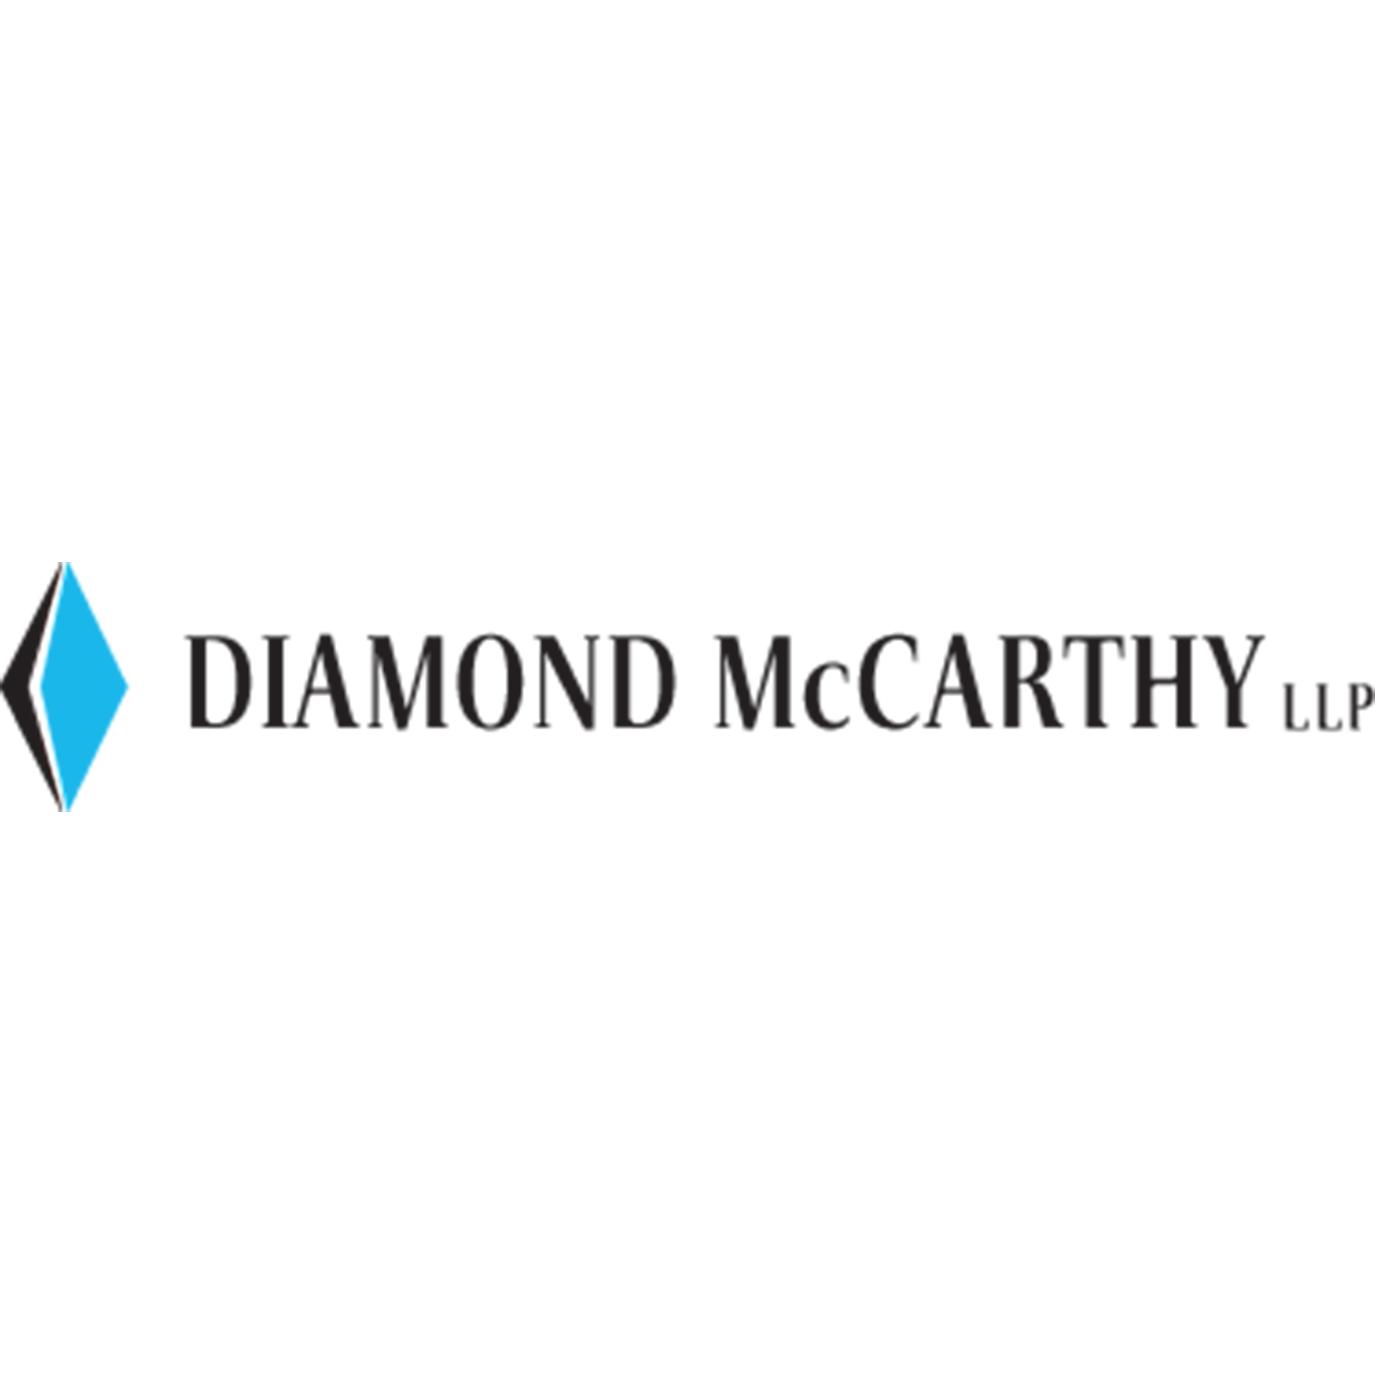 Diamond McCarthy LLP